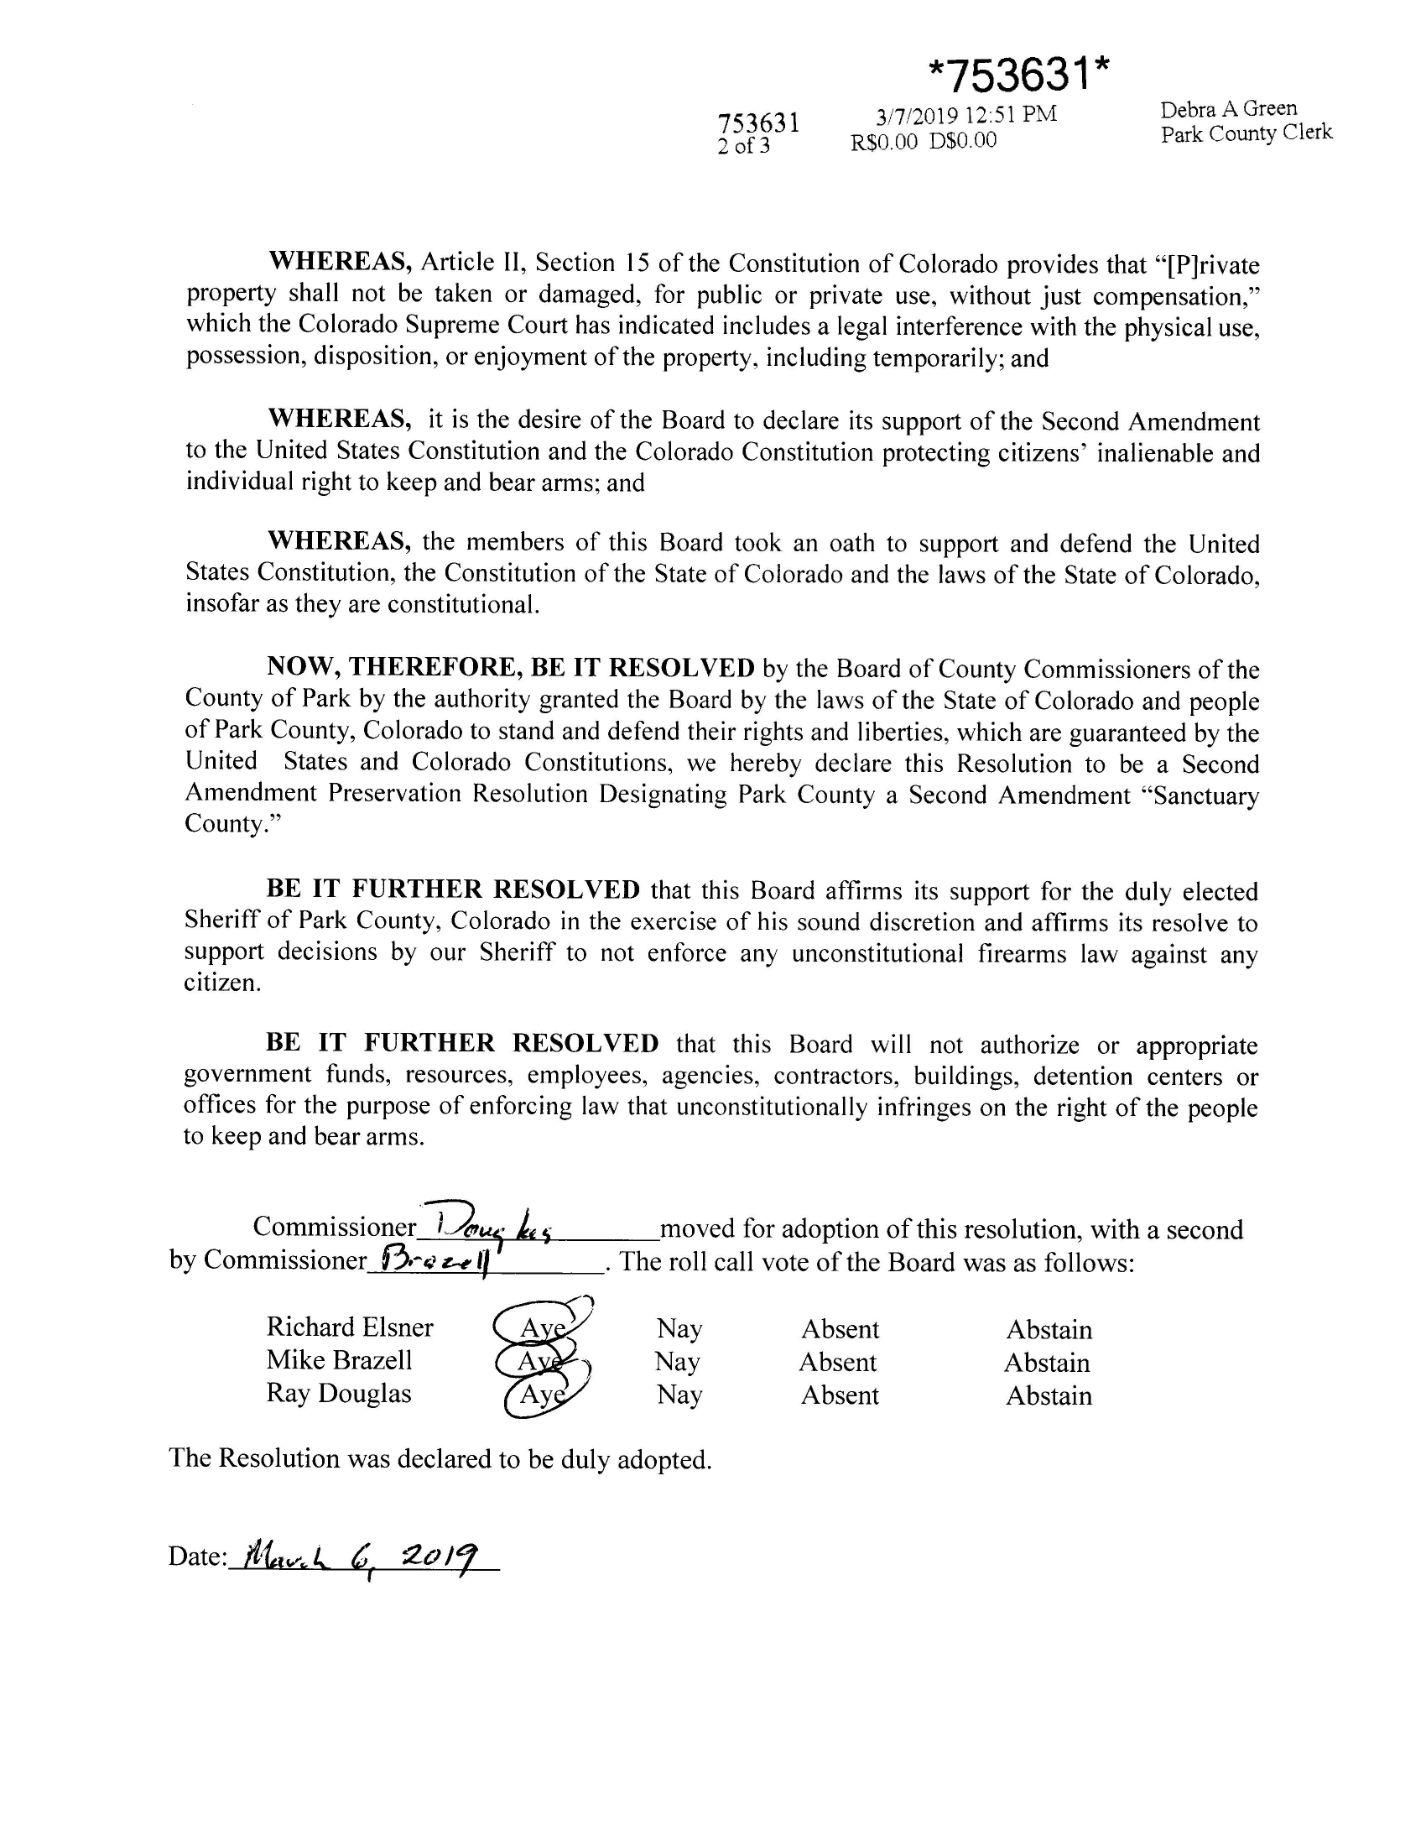 19-15 Declaring Park County Second Amendment Sanctuary County_Page_2